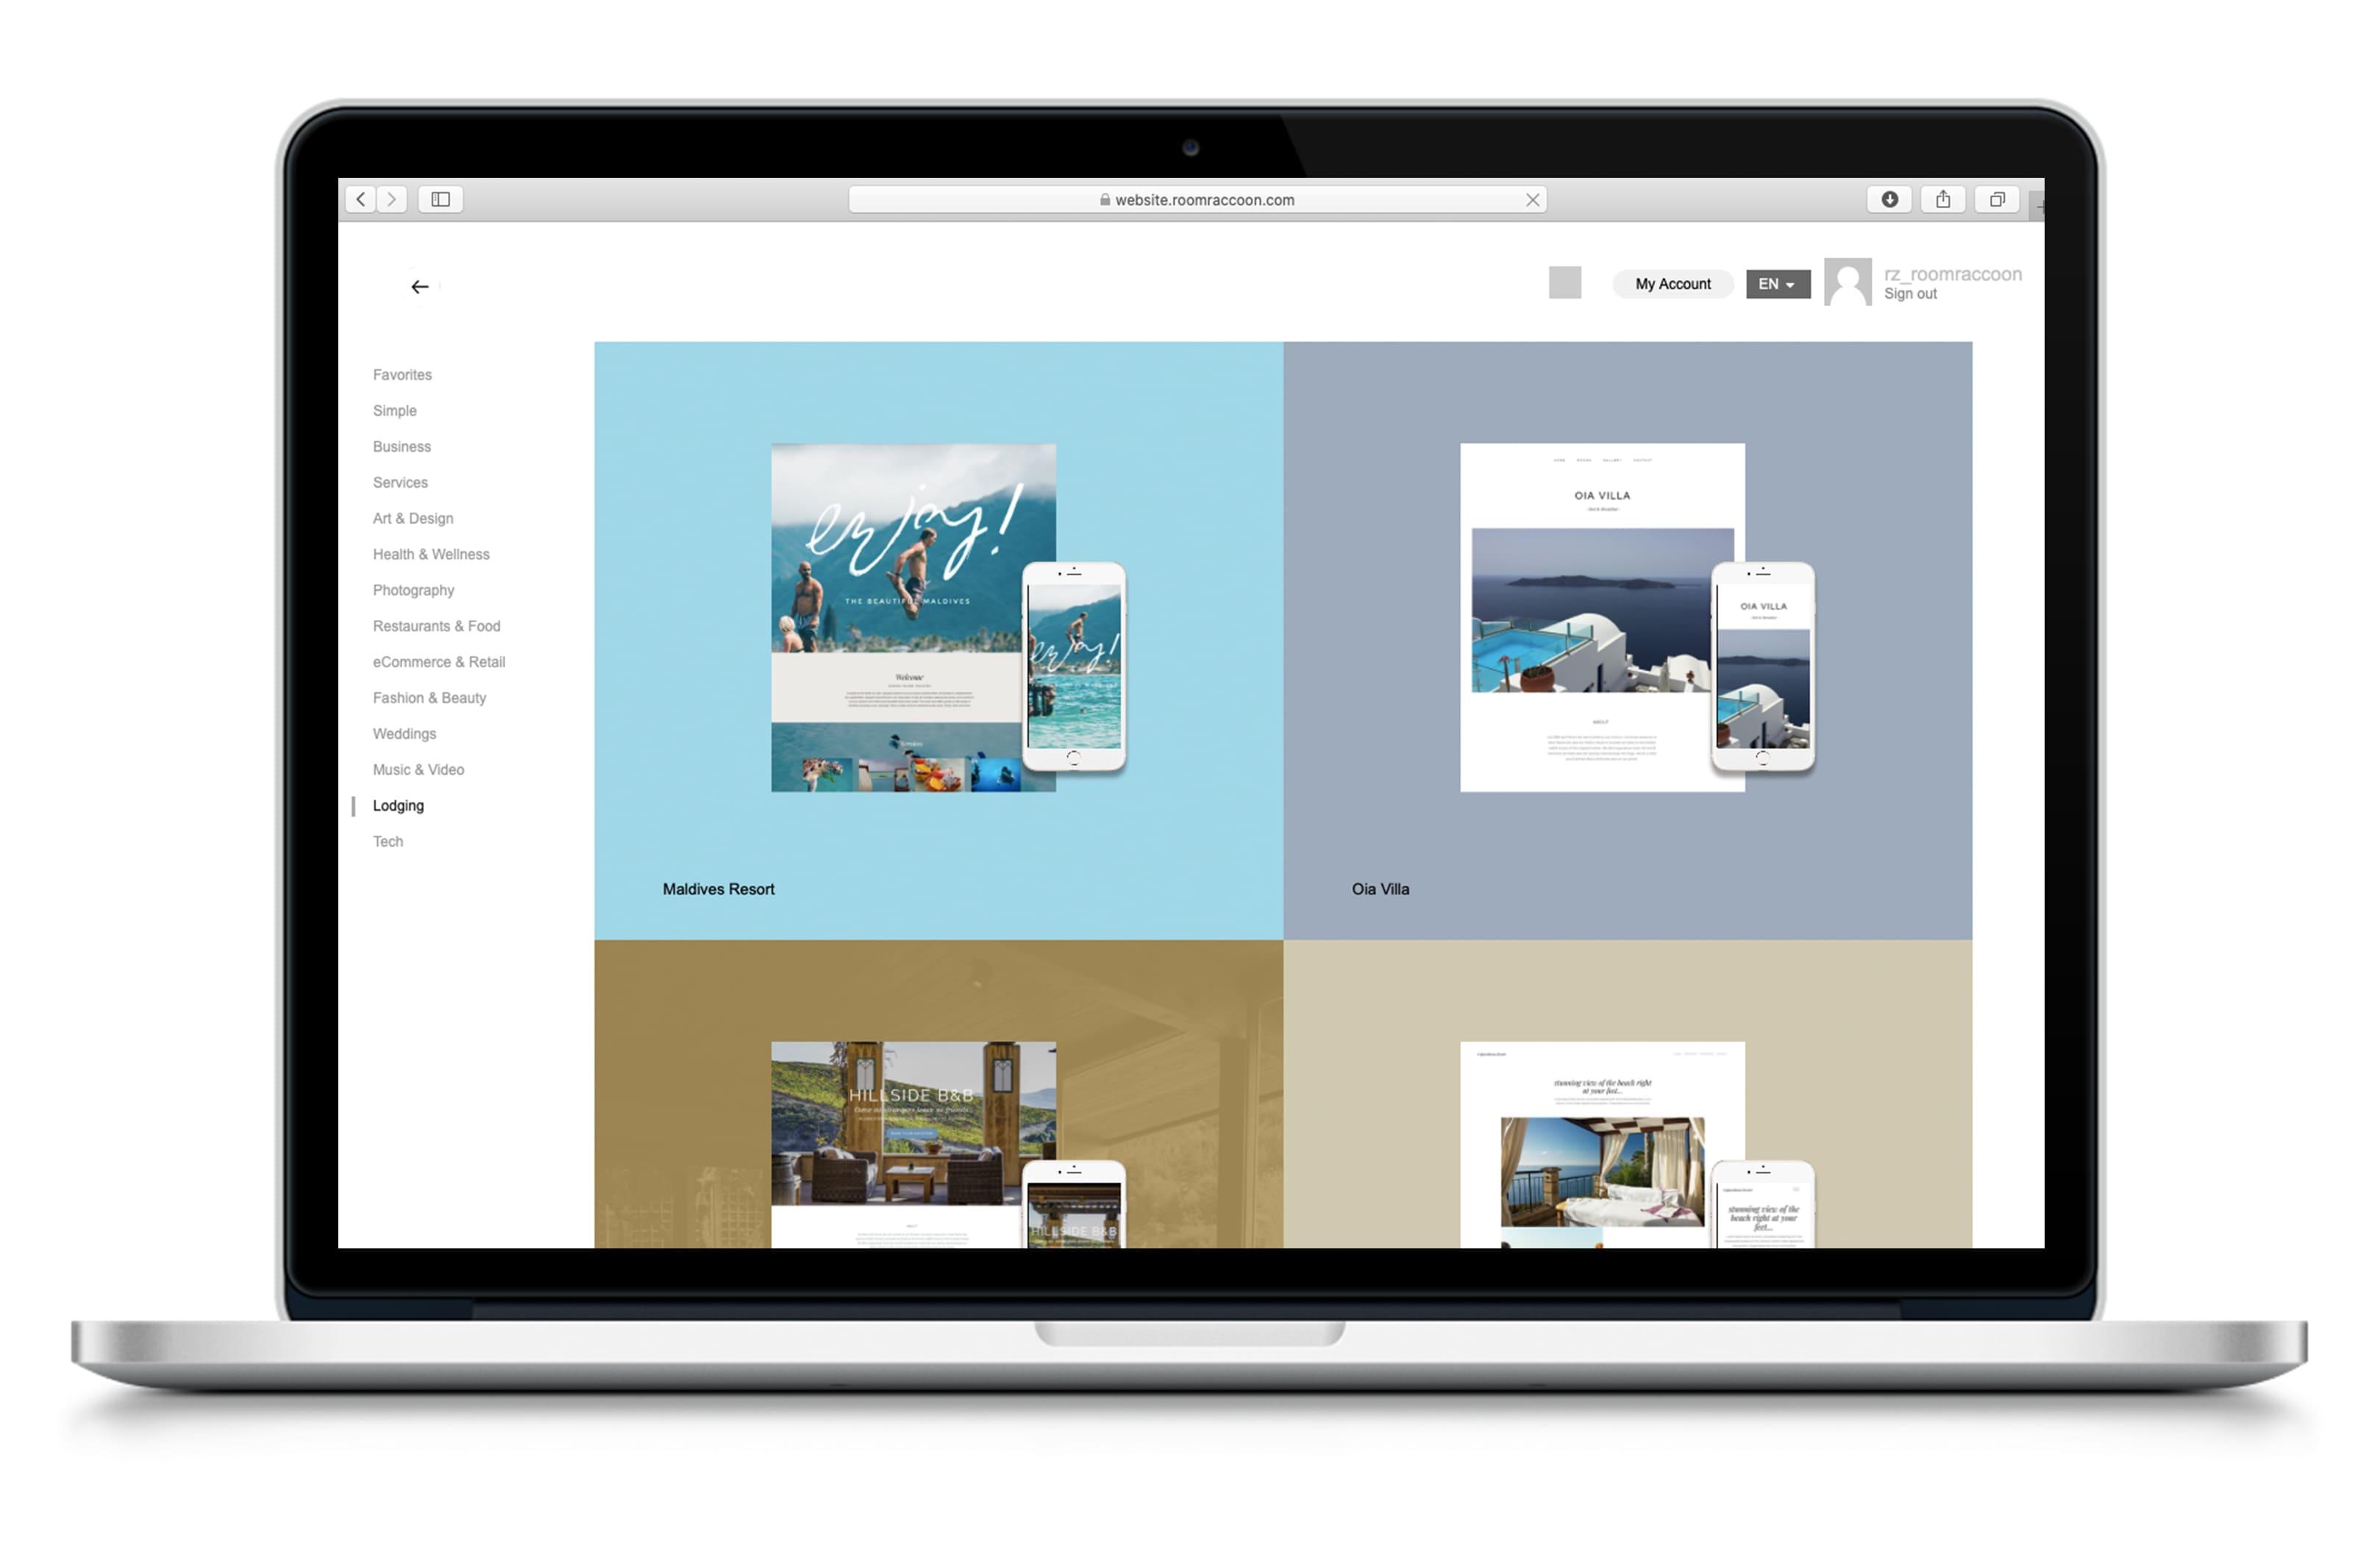 Hotel website builder - All-in-one software   RoomRaccoon